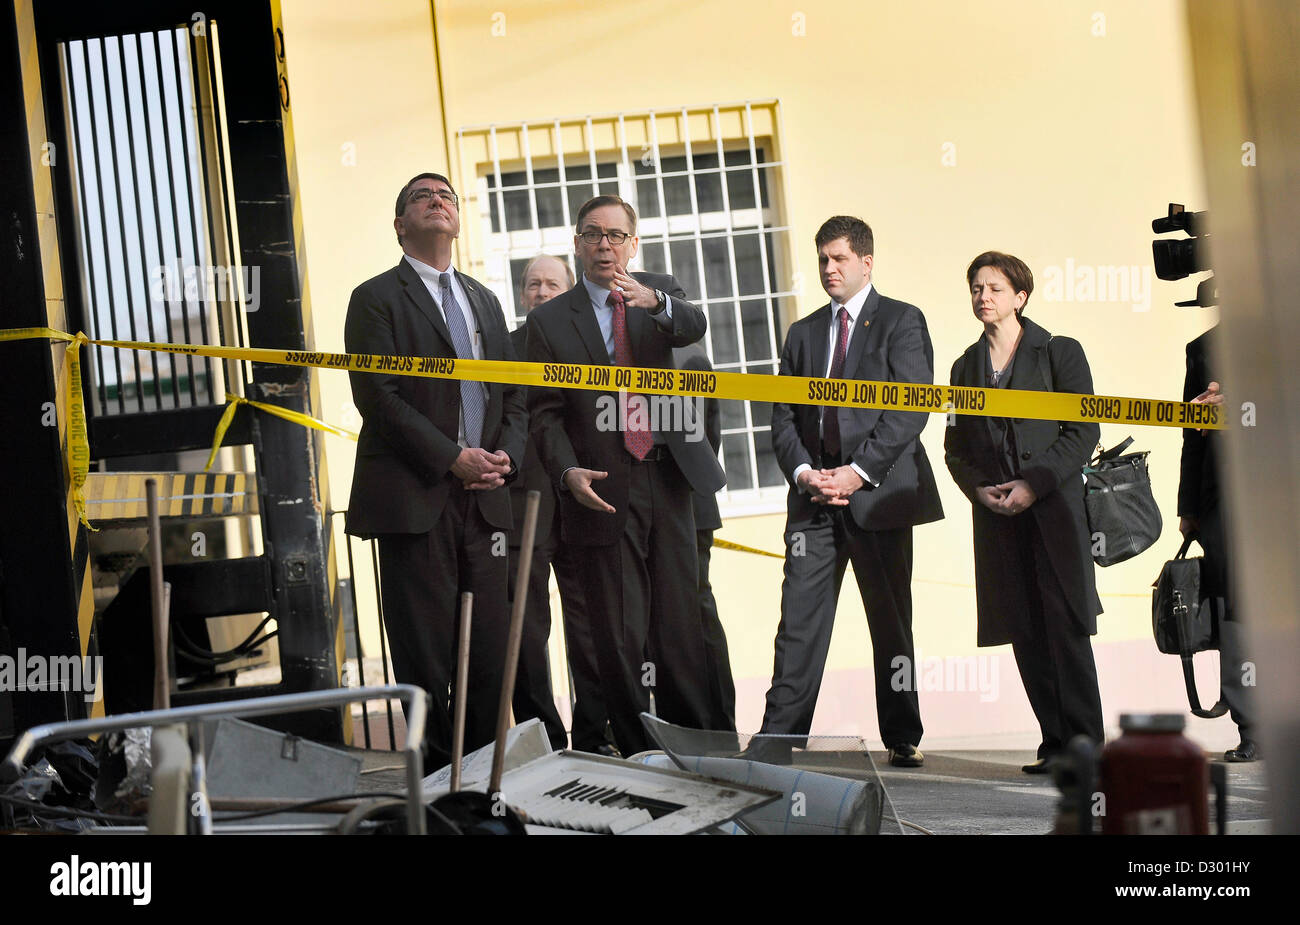 US Deputy Secretary of Defense Ashton Carter (left) accompanied by Jess Baily, Deputy Chief of Mission, views damage - Stock Image